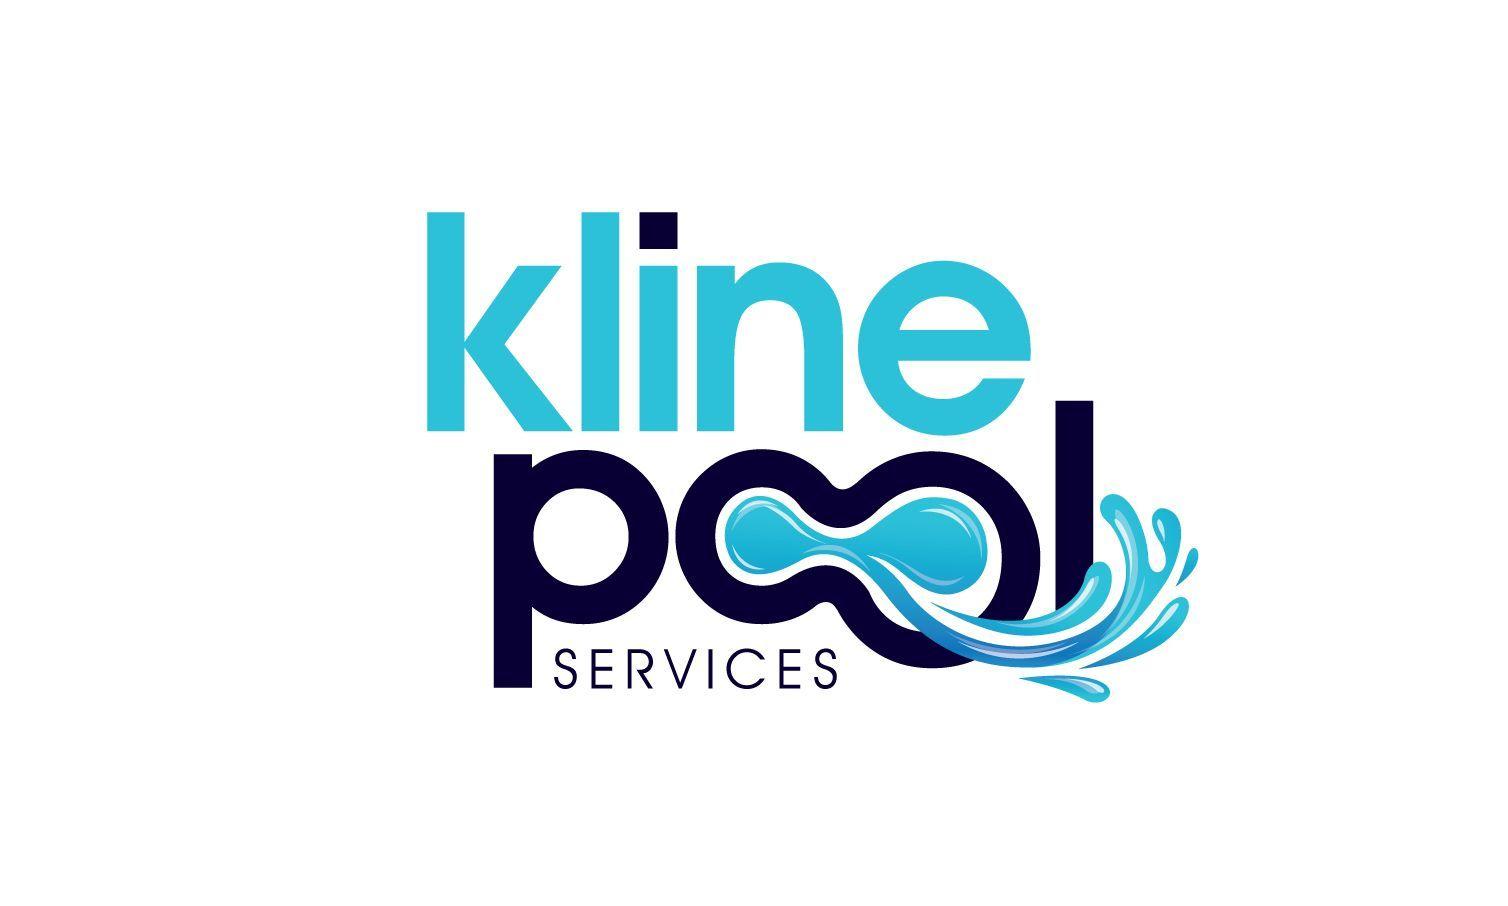 Swimming Pool Logos And Designs